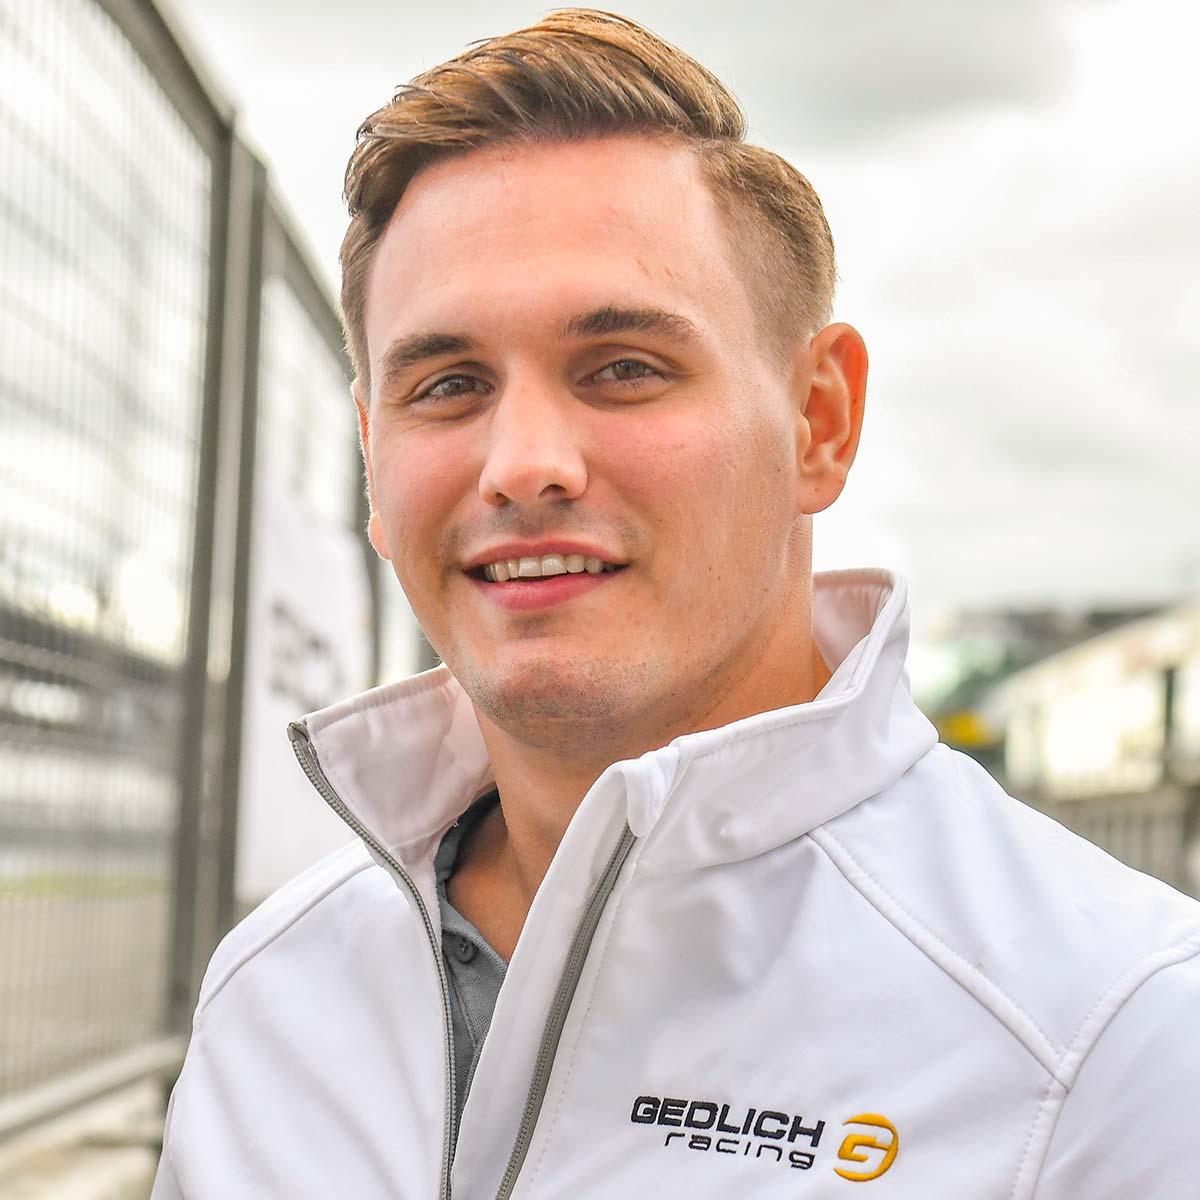 GEDLICH Racing - Robin Selbach, Vertriebsleitung